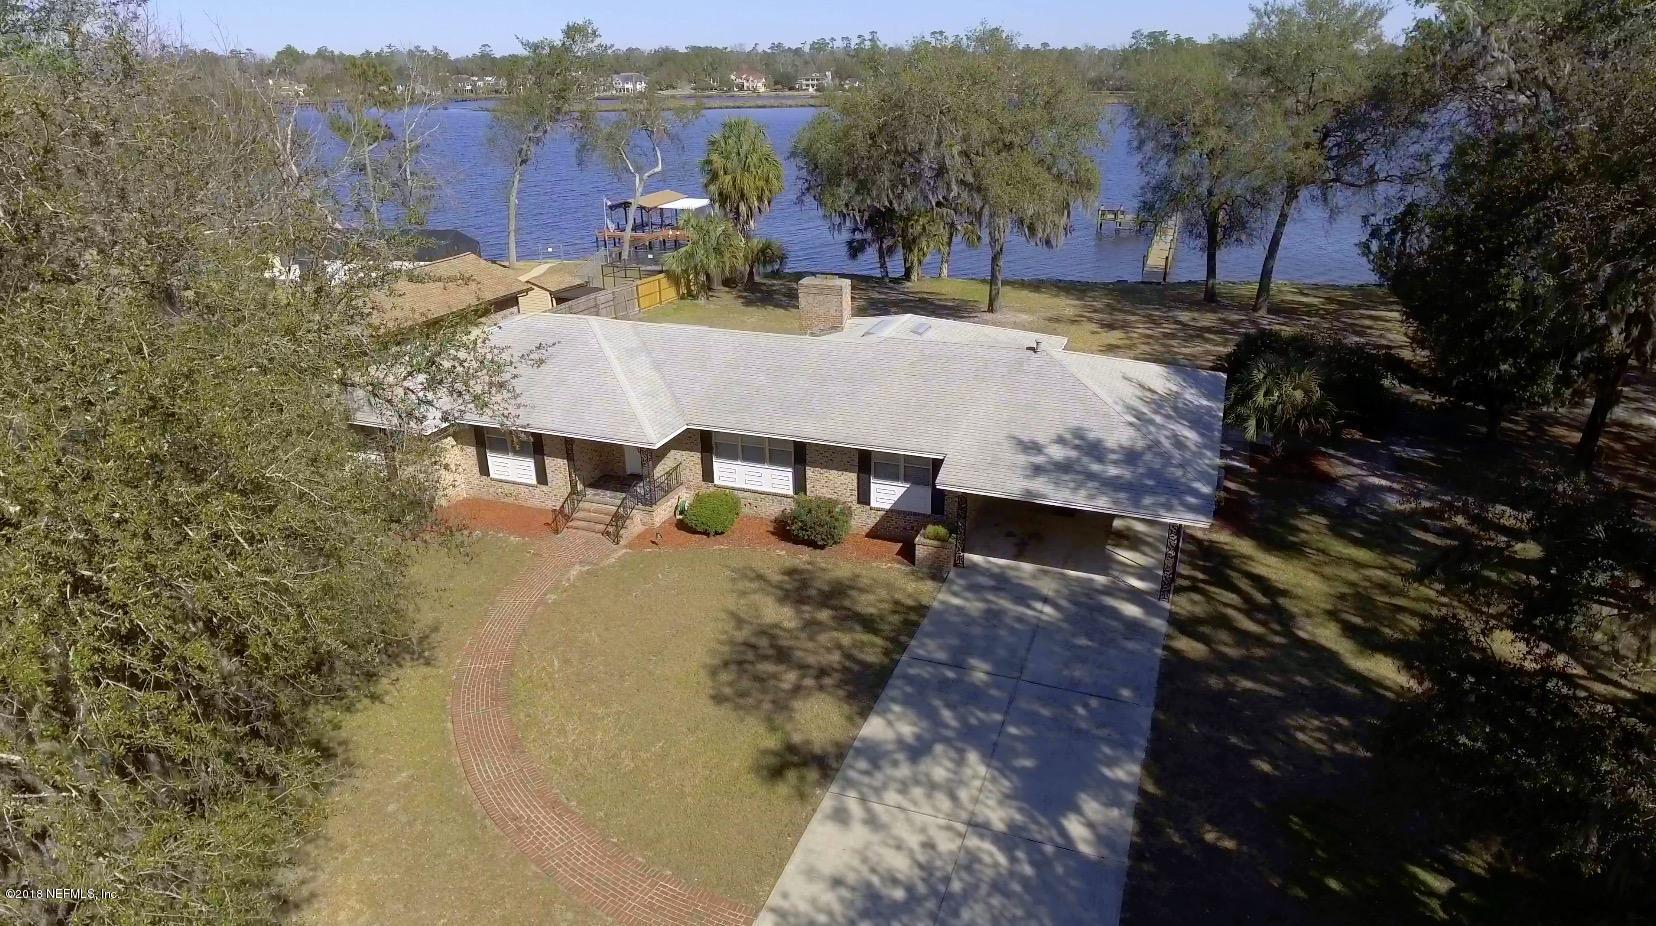 4921 ORTEGA FARMS, JACKSONVILLE, FLORIDA 32210, 4 Bedrooms Bedrooms, ,3 BathroomsBathrooms,Residential - single family,For sale,ORTEGA FARMS,1005879